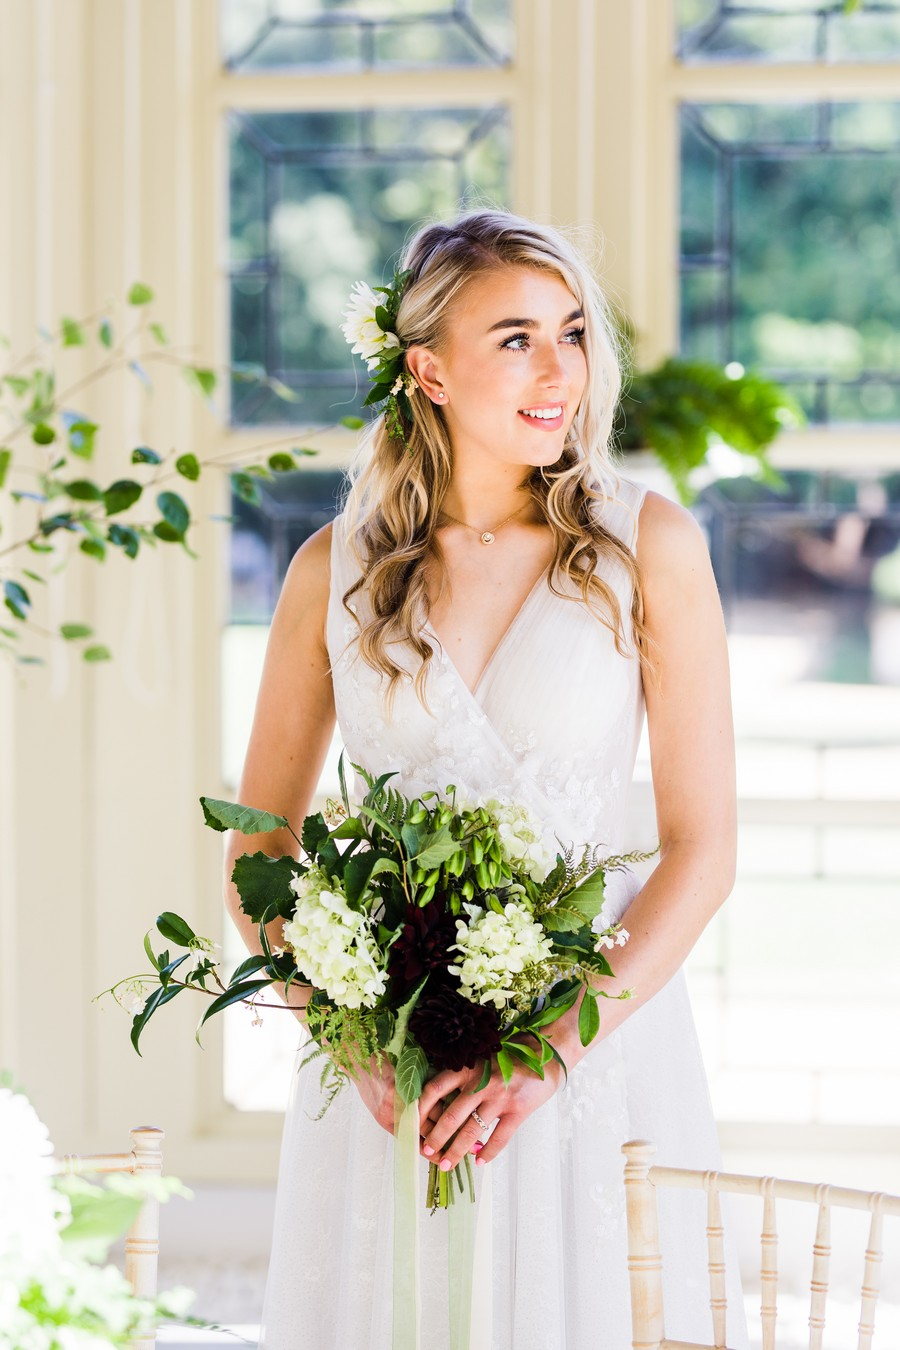 Highcliffe Castle wedding inspiration on the English Wedding Blog (22)